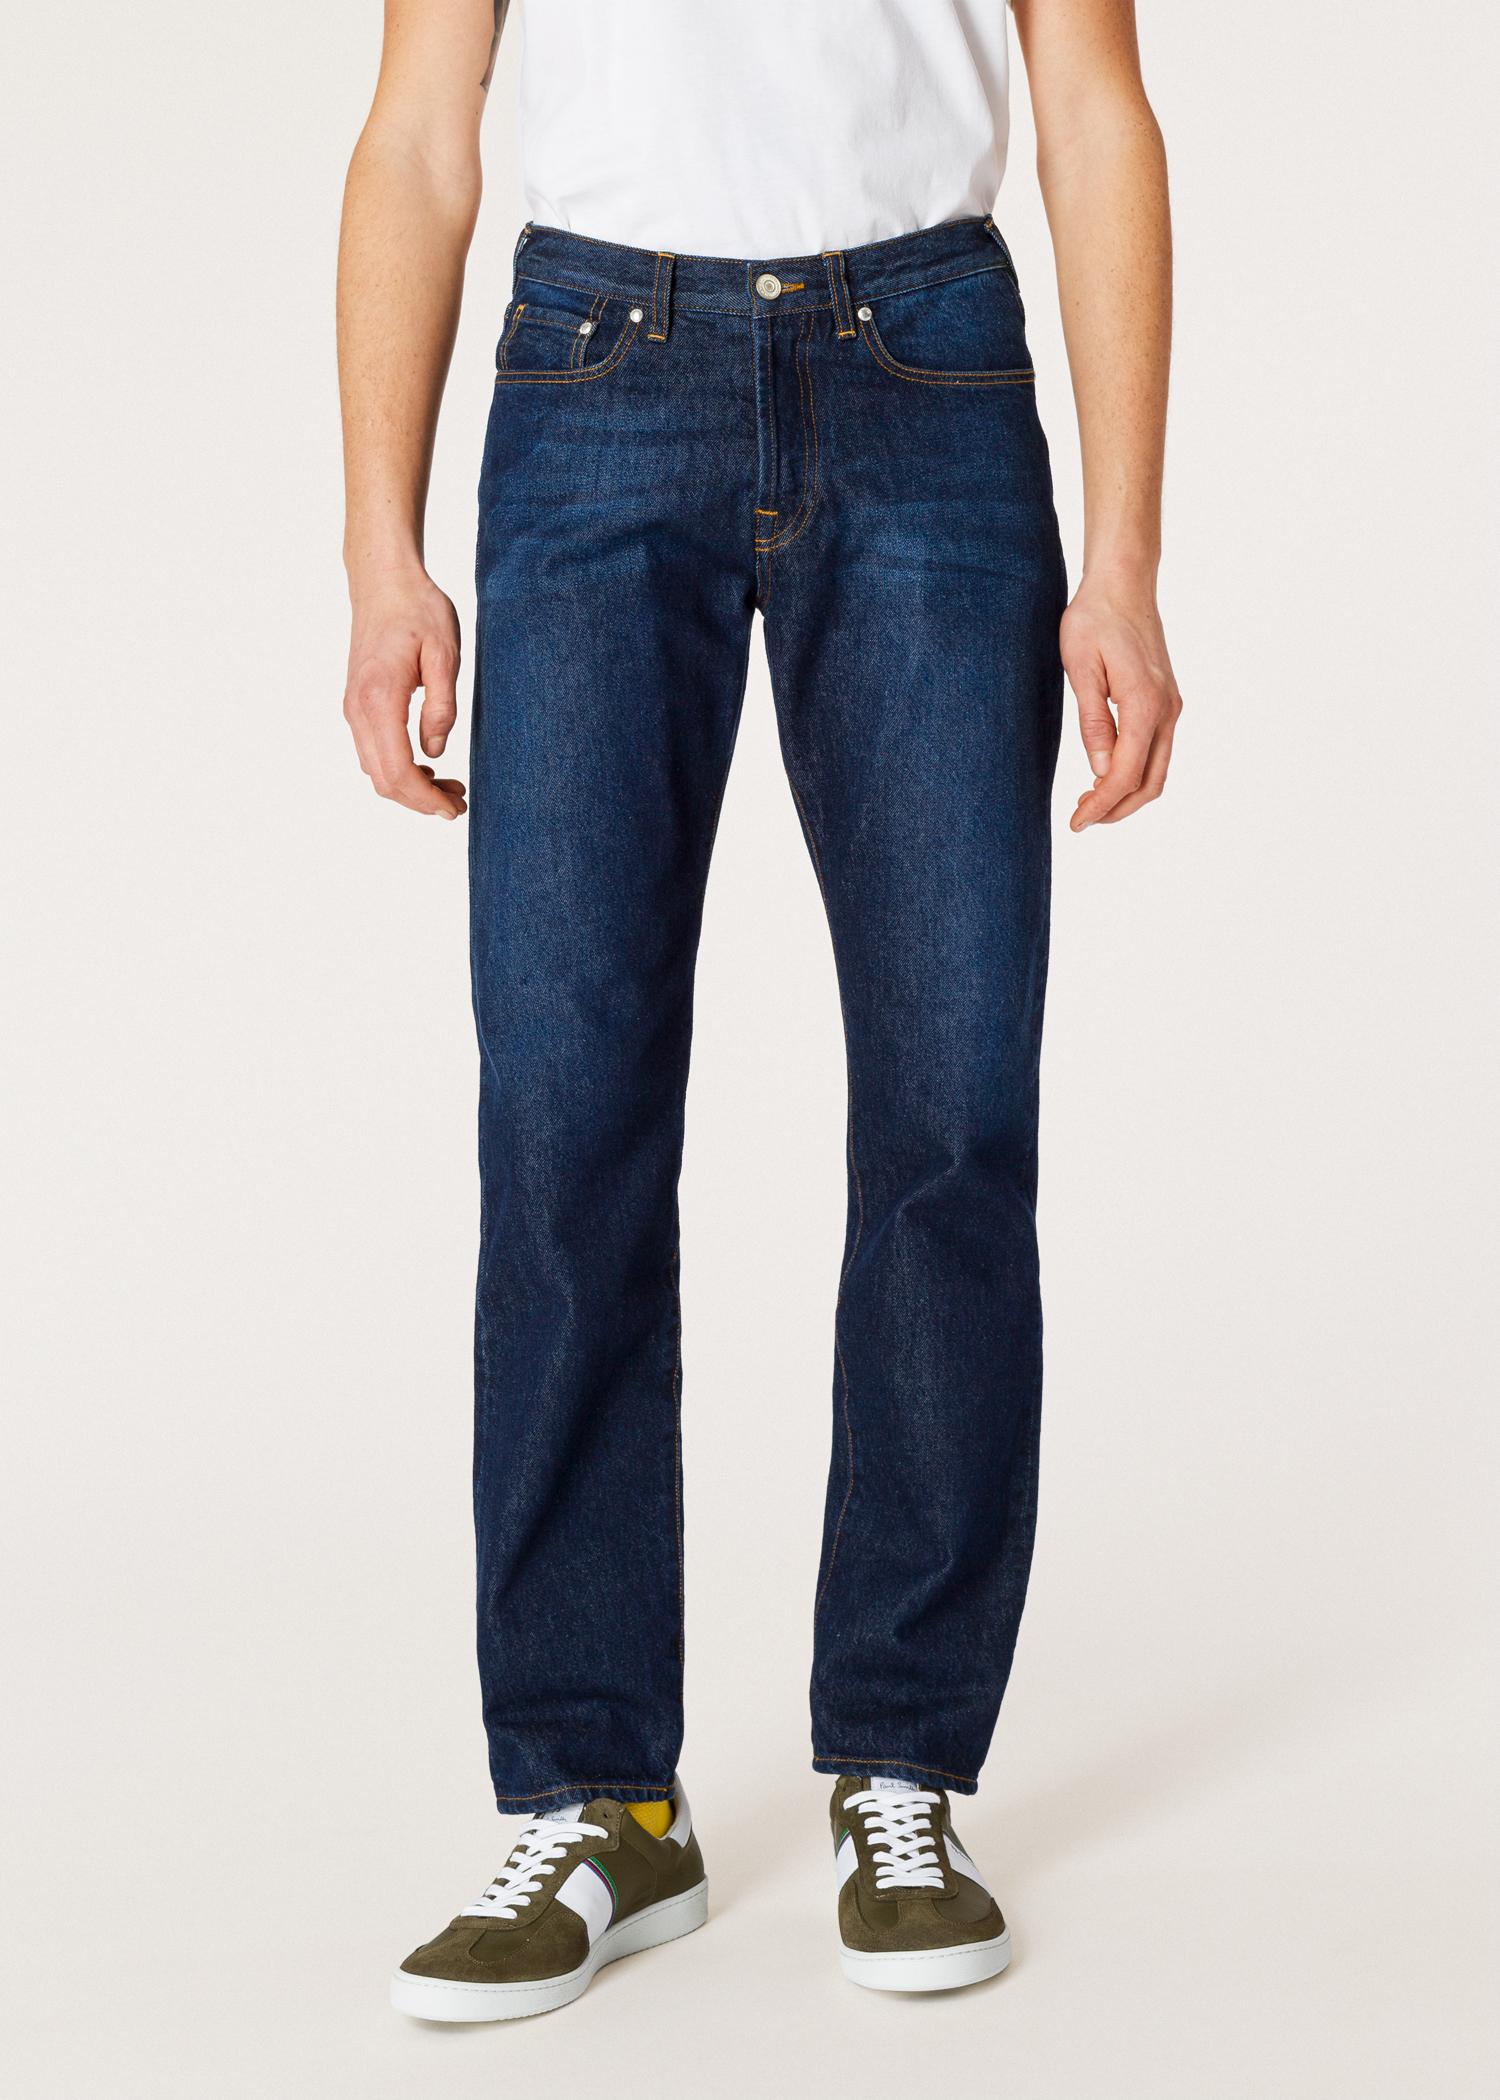 0eafa60b692 Men s Classic-Fit Dark-Wash  Organic Salt   Pepper  Denim Jeans ...